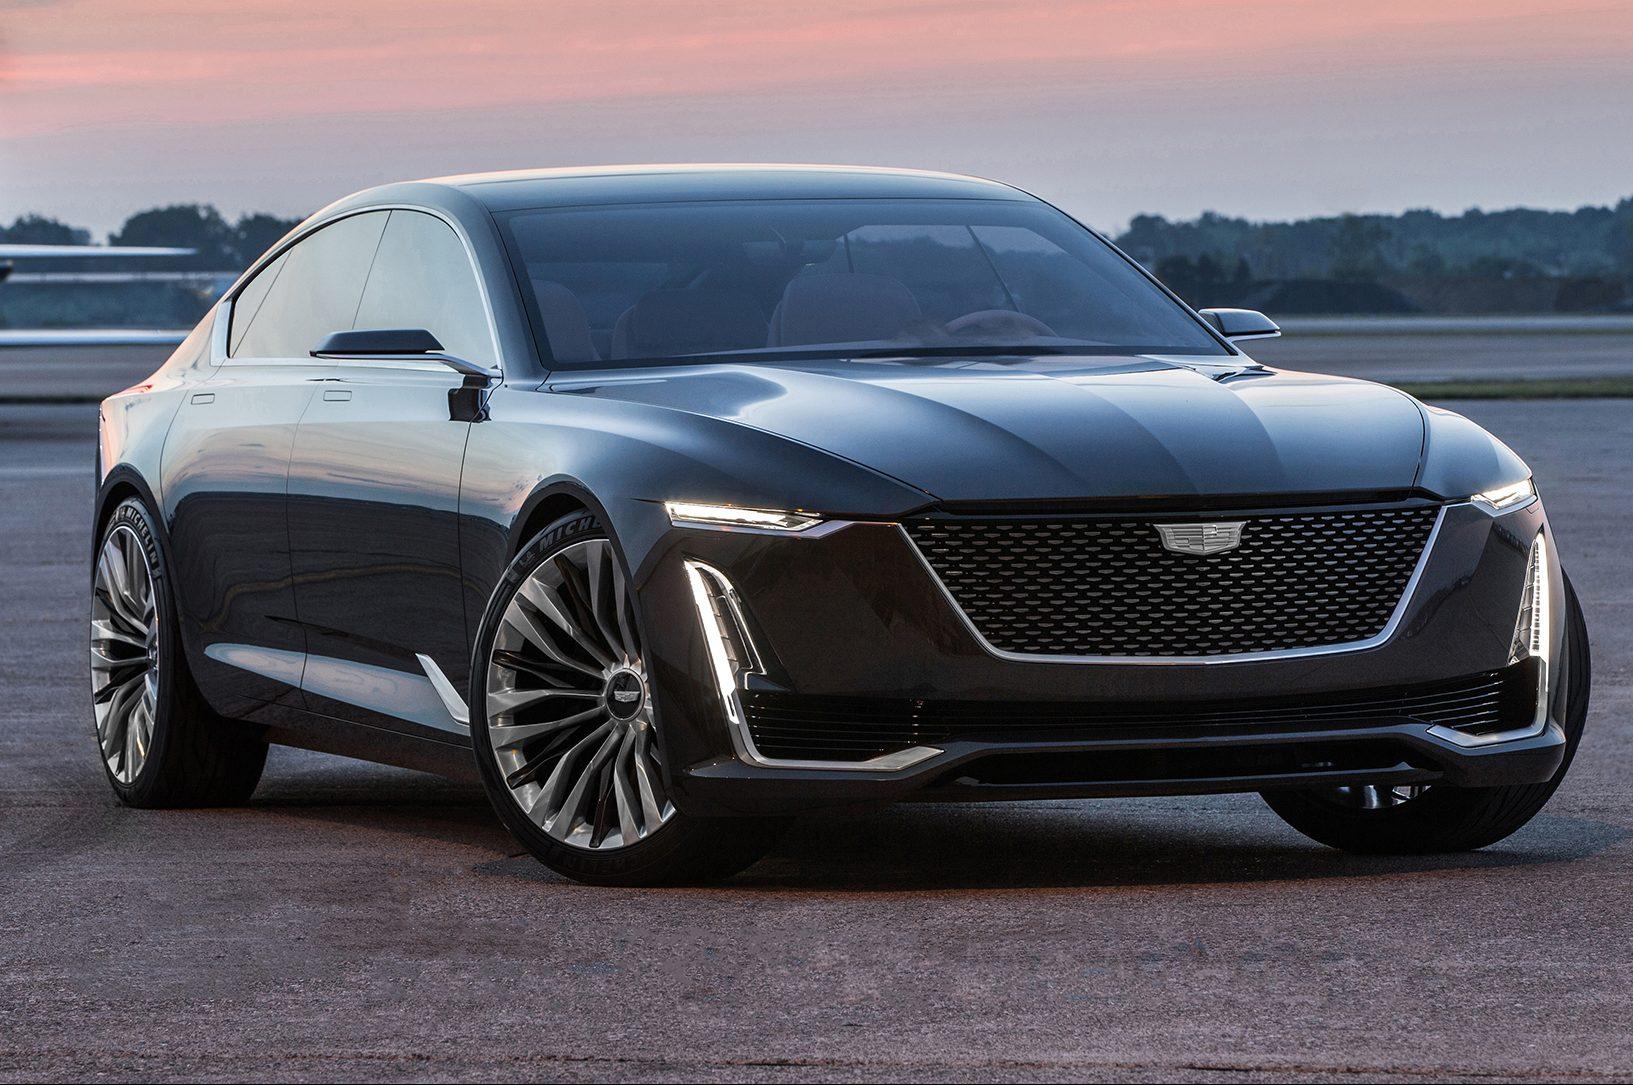 2020 Cadillac Escalade And Escalade Esv What To Expect Automobile